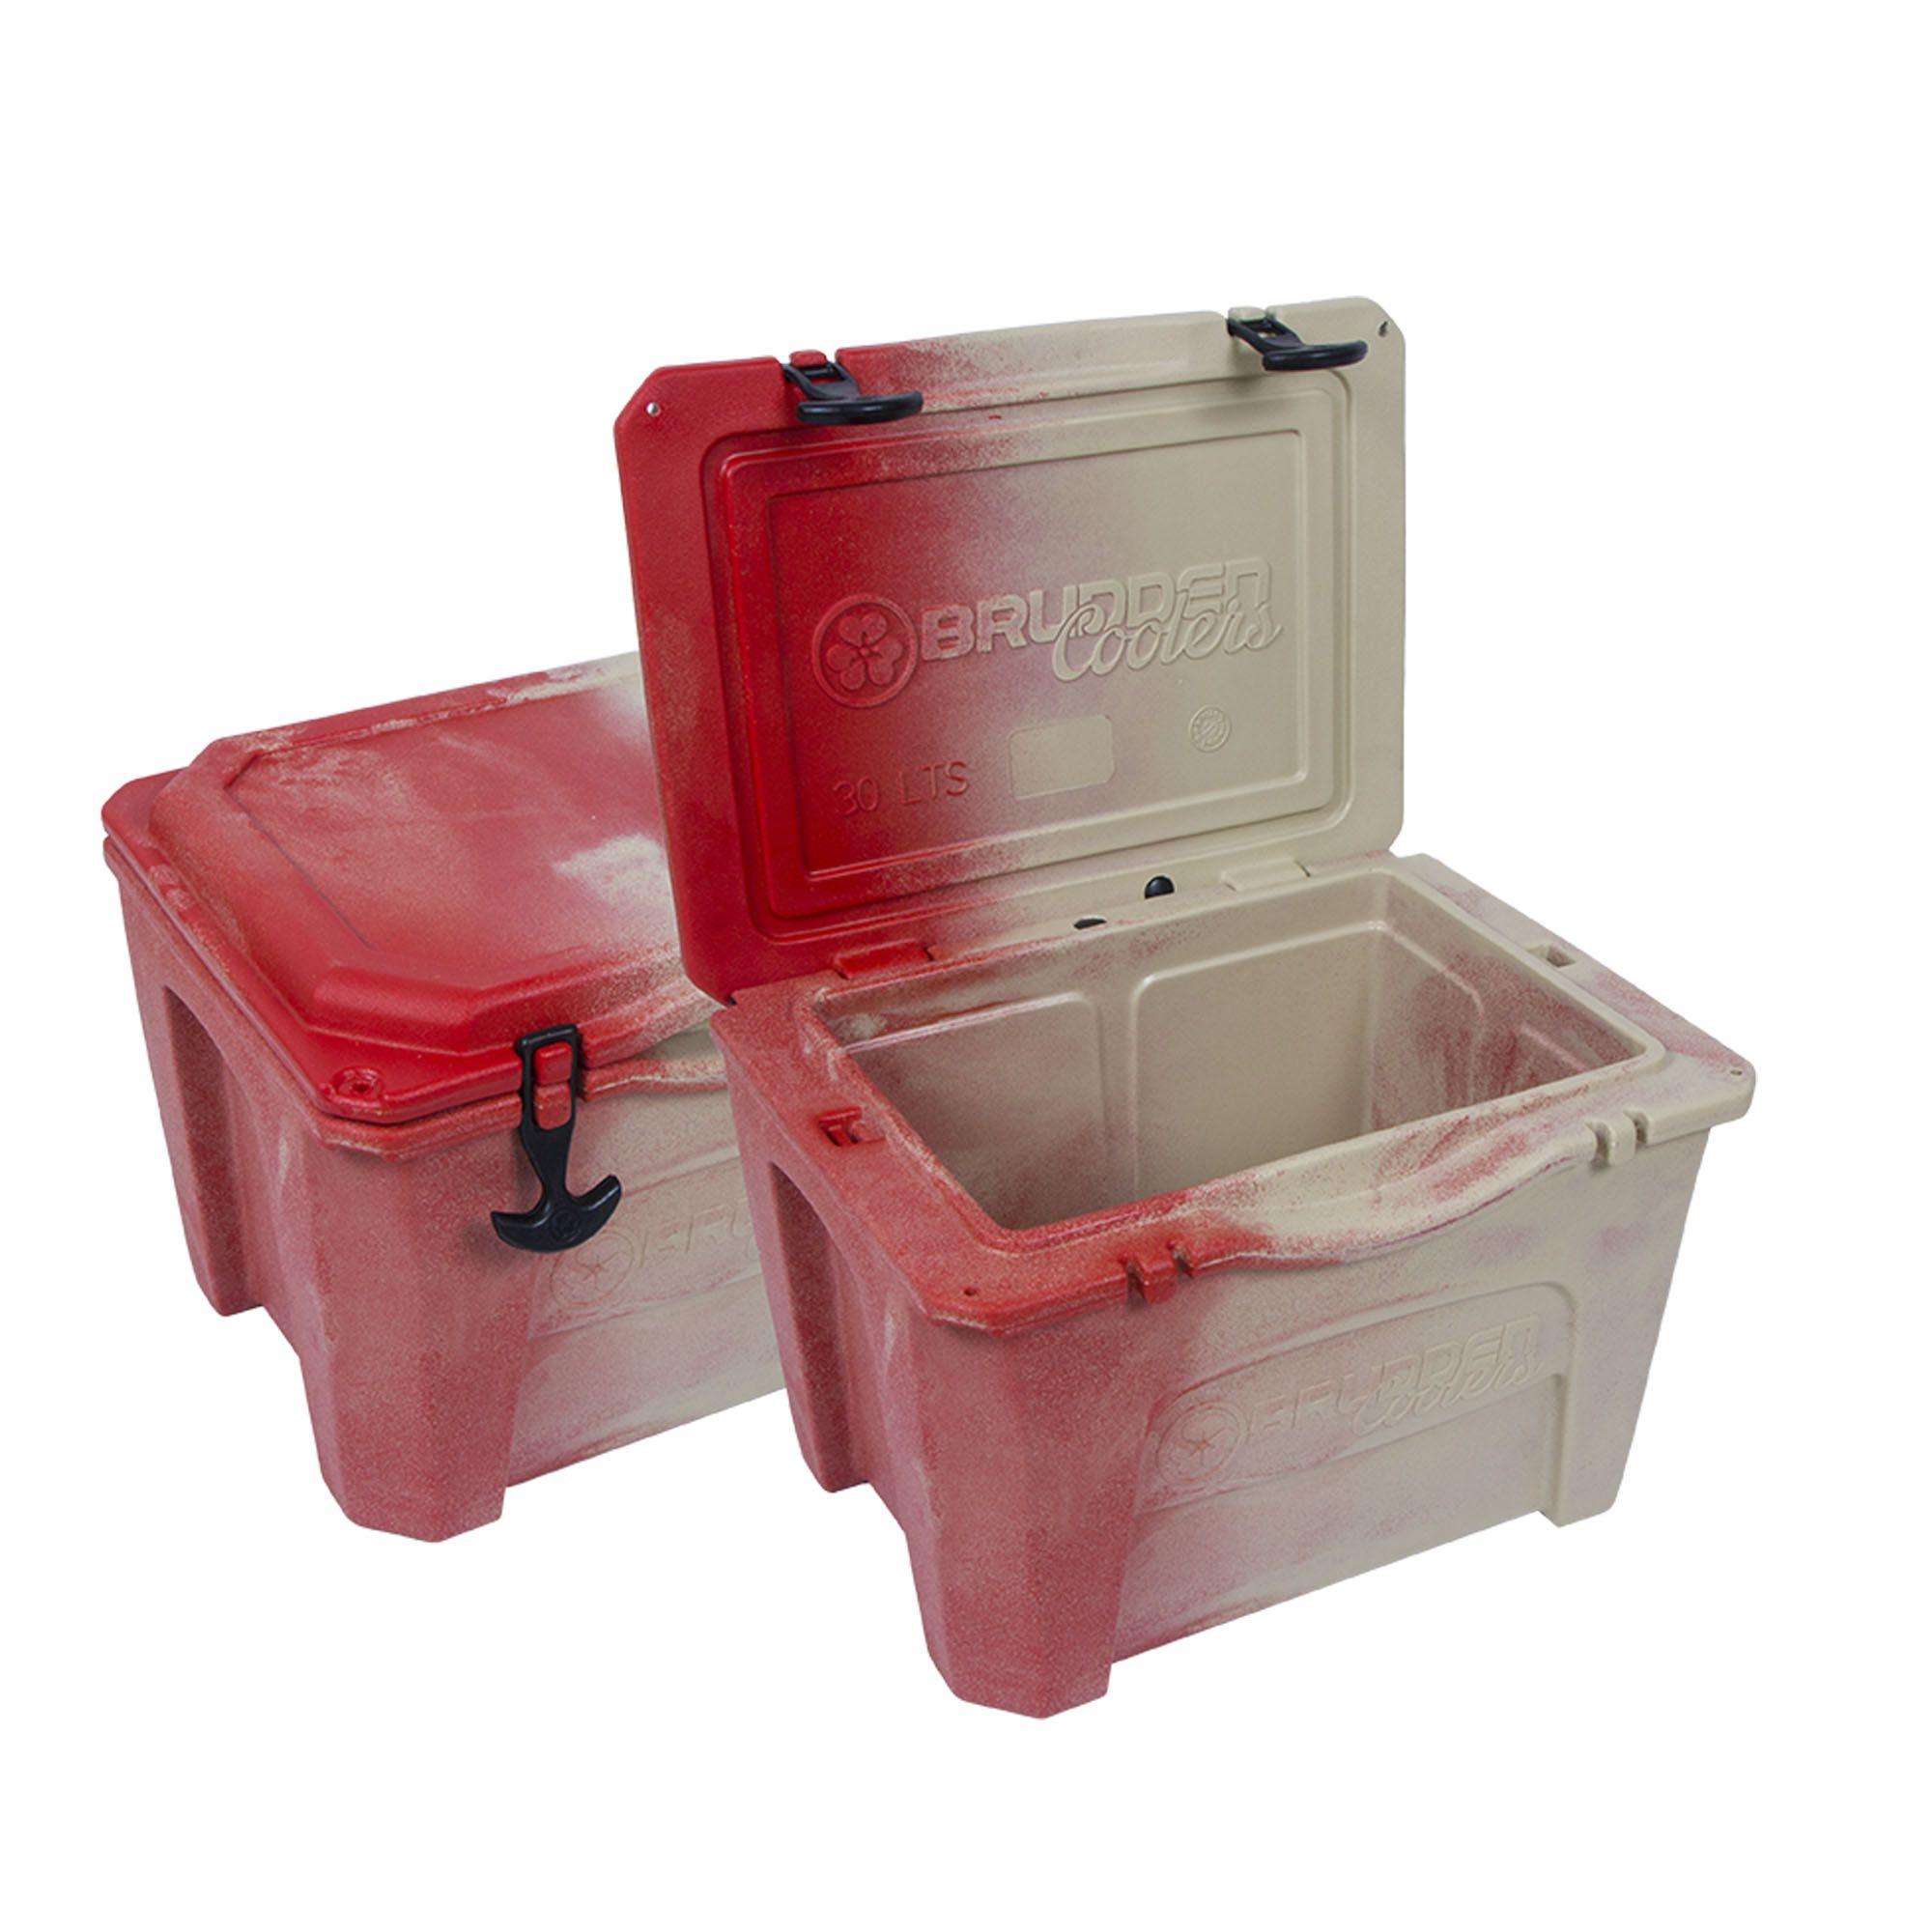 Cooler 30 litros